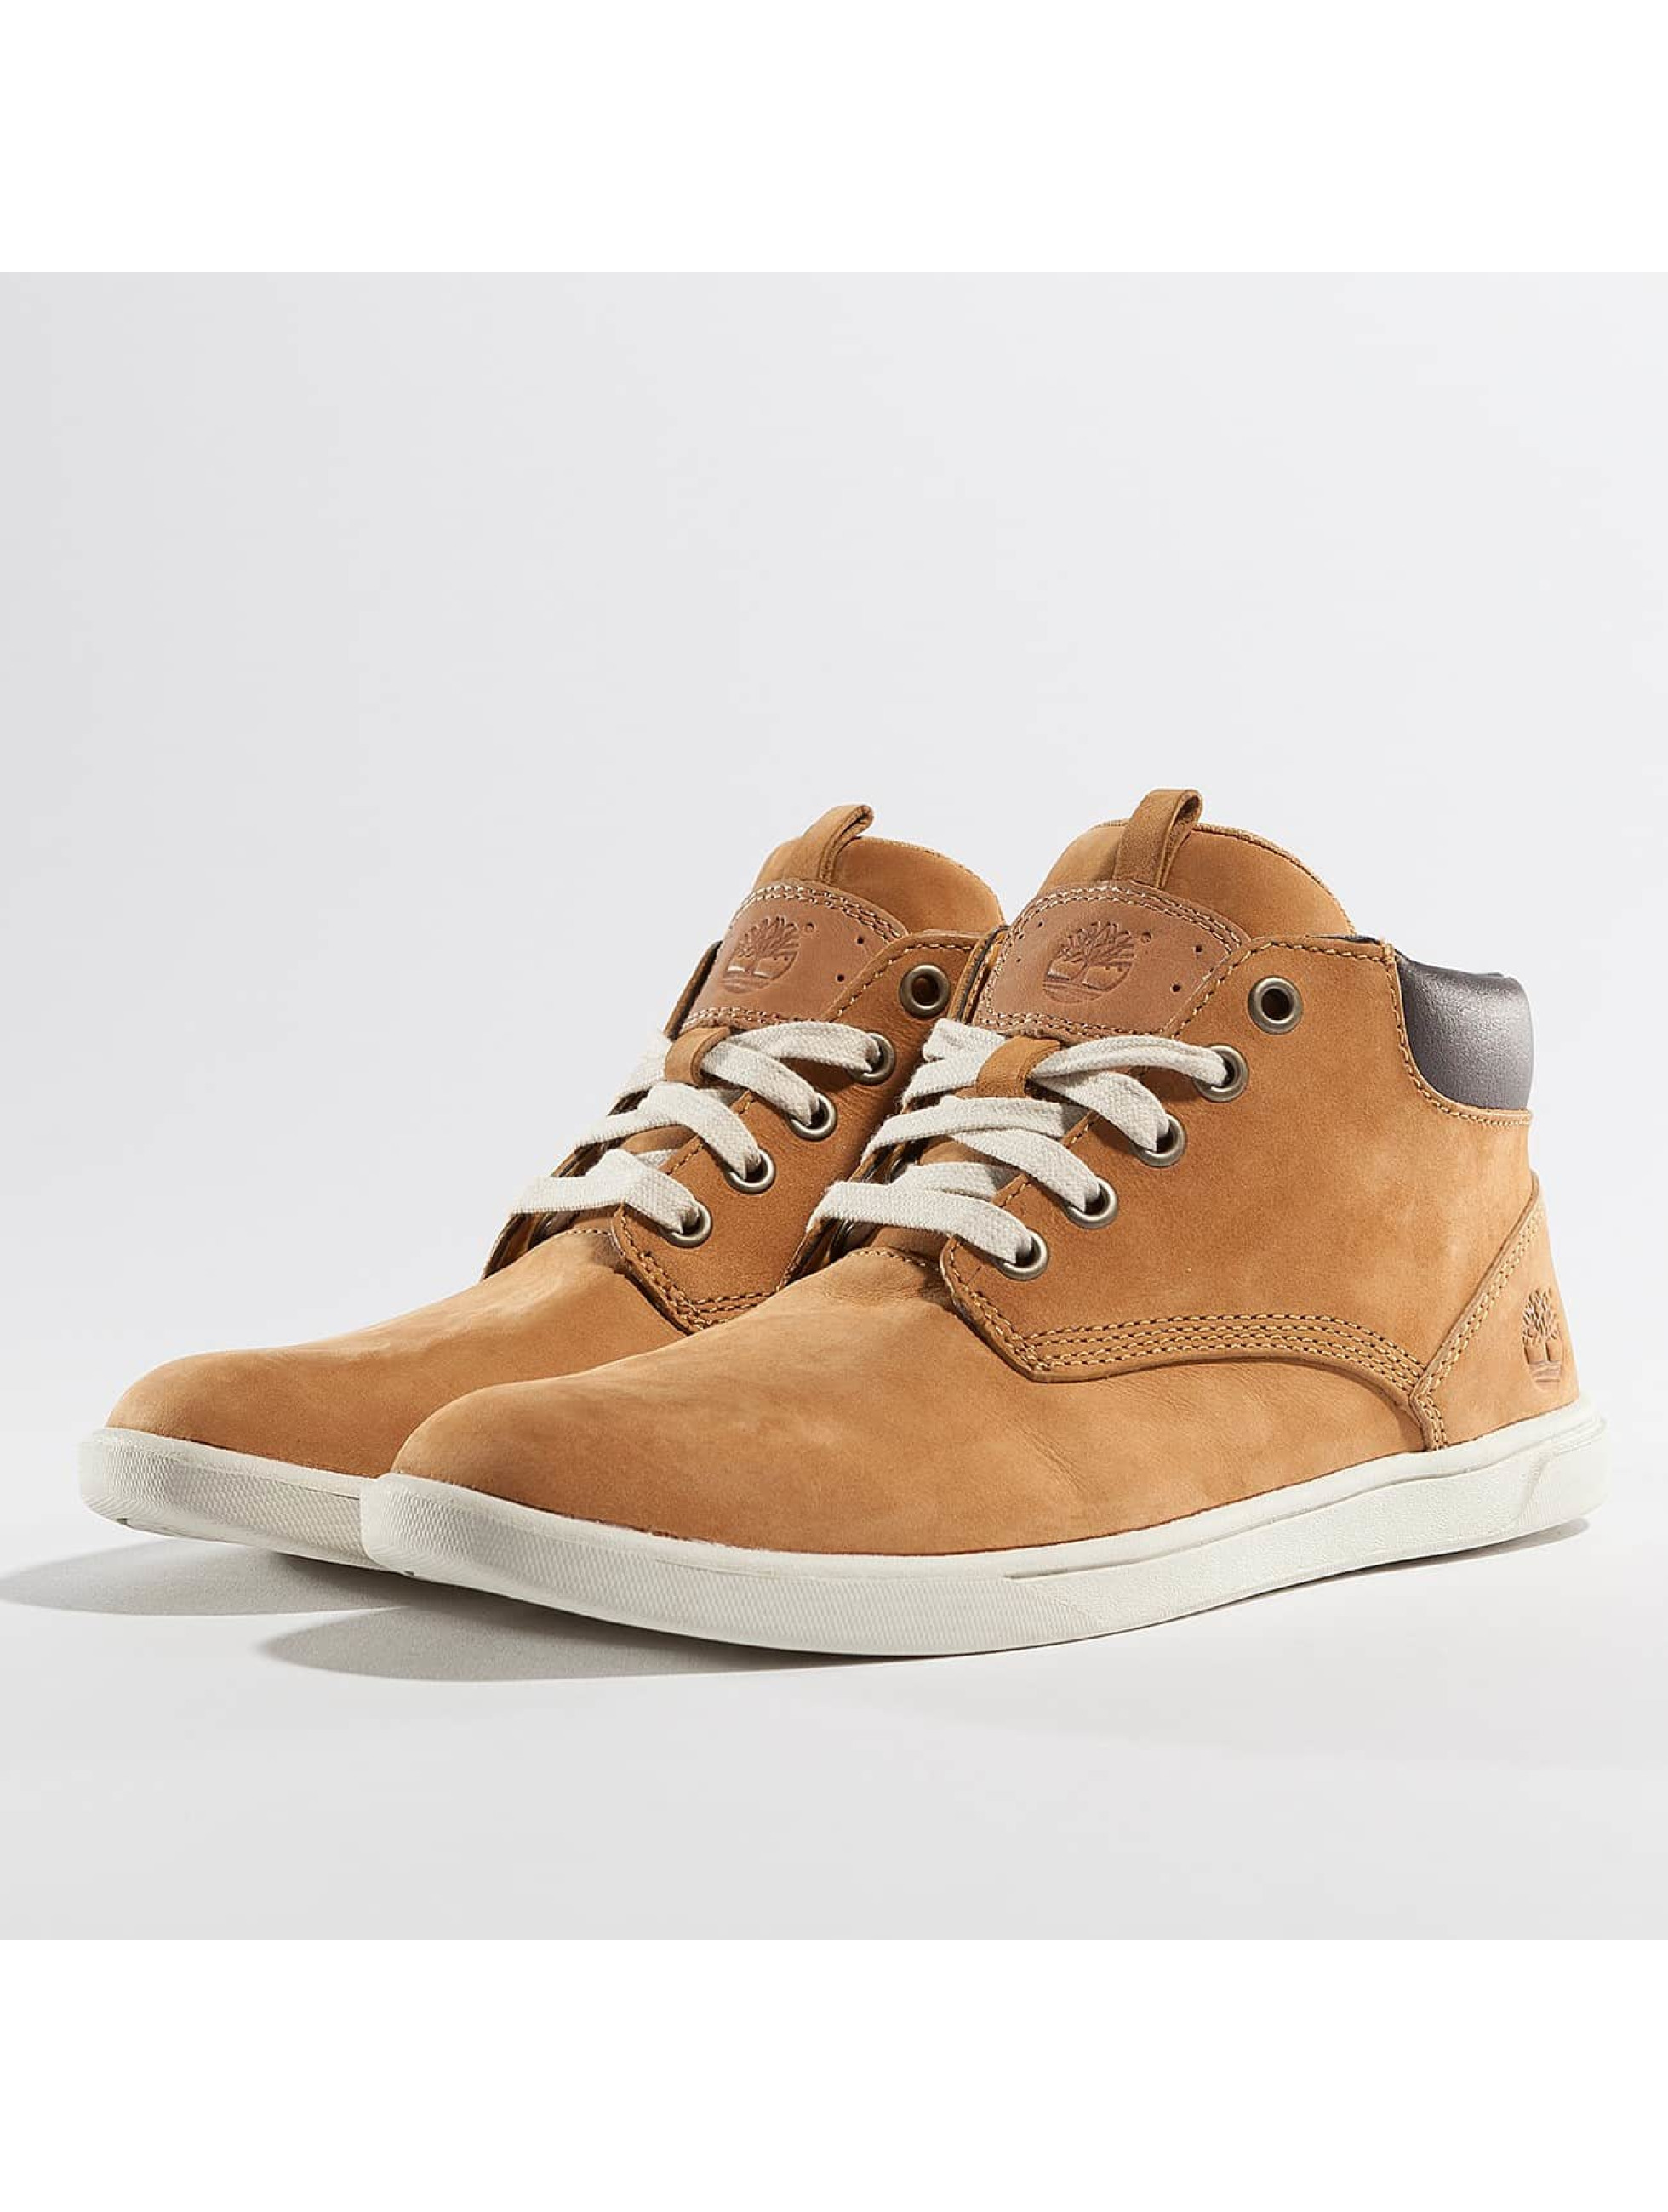 Timberland Sneaker Earthkeepers Groveton Leather Chukka beige